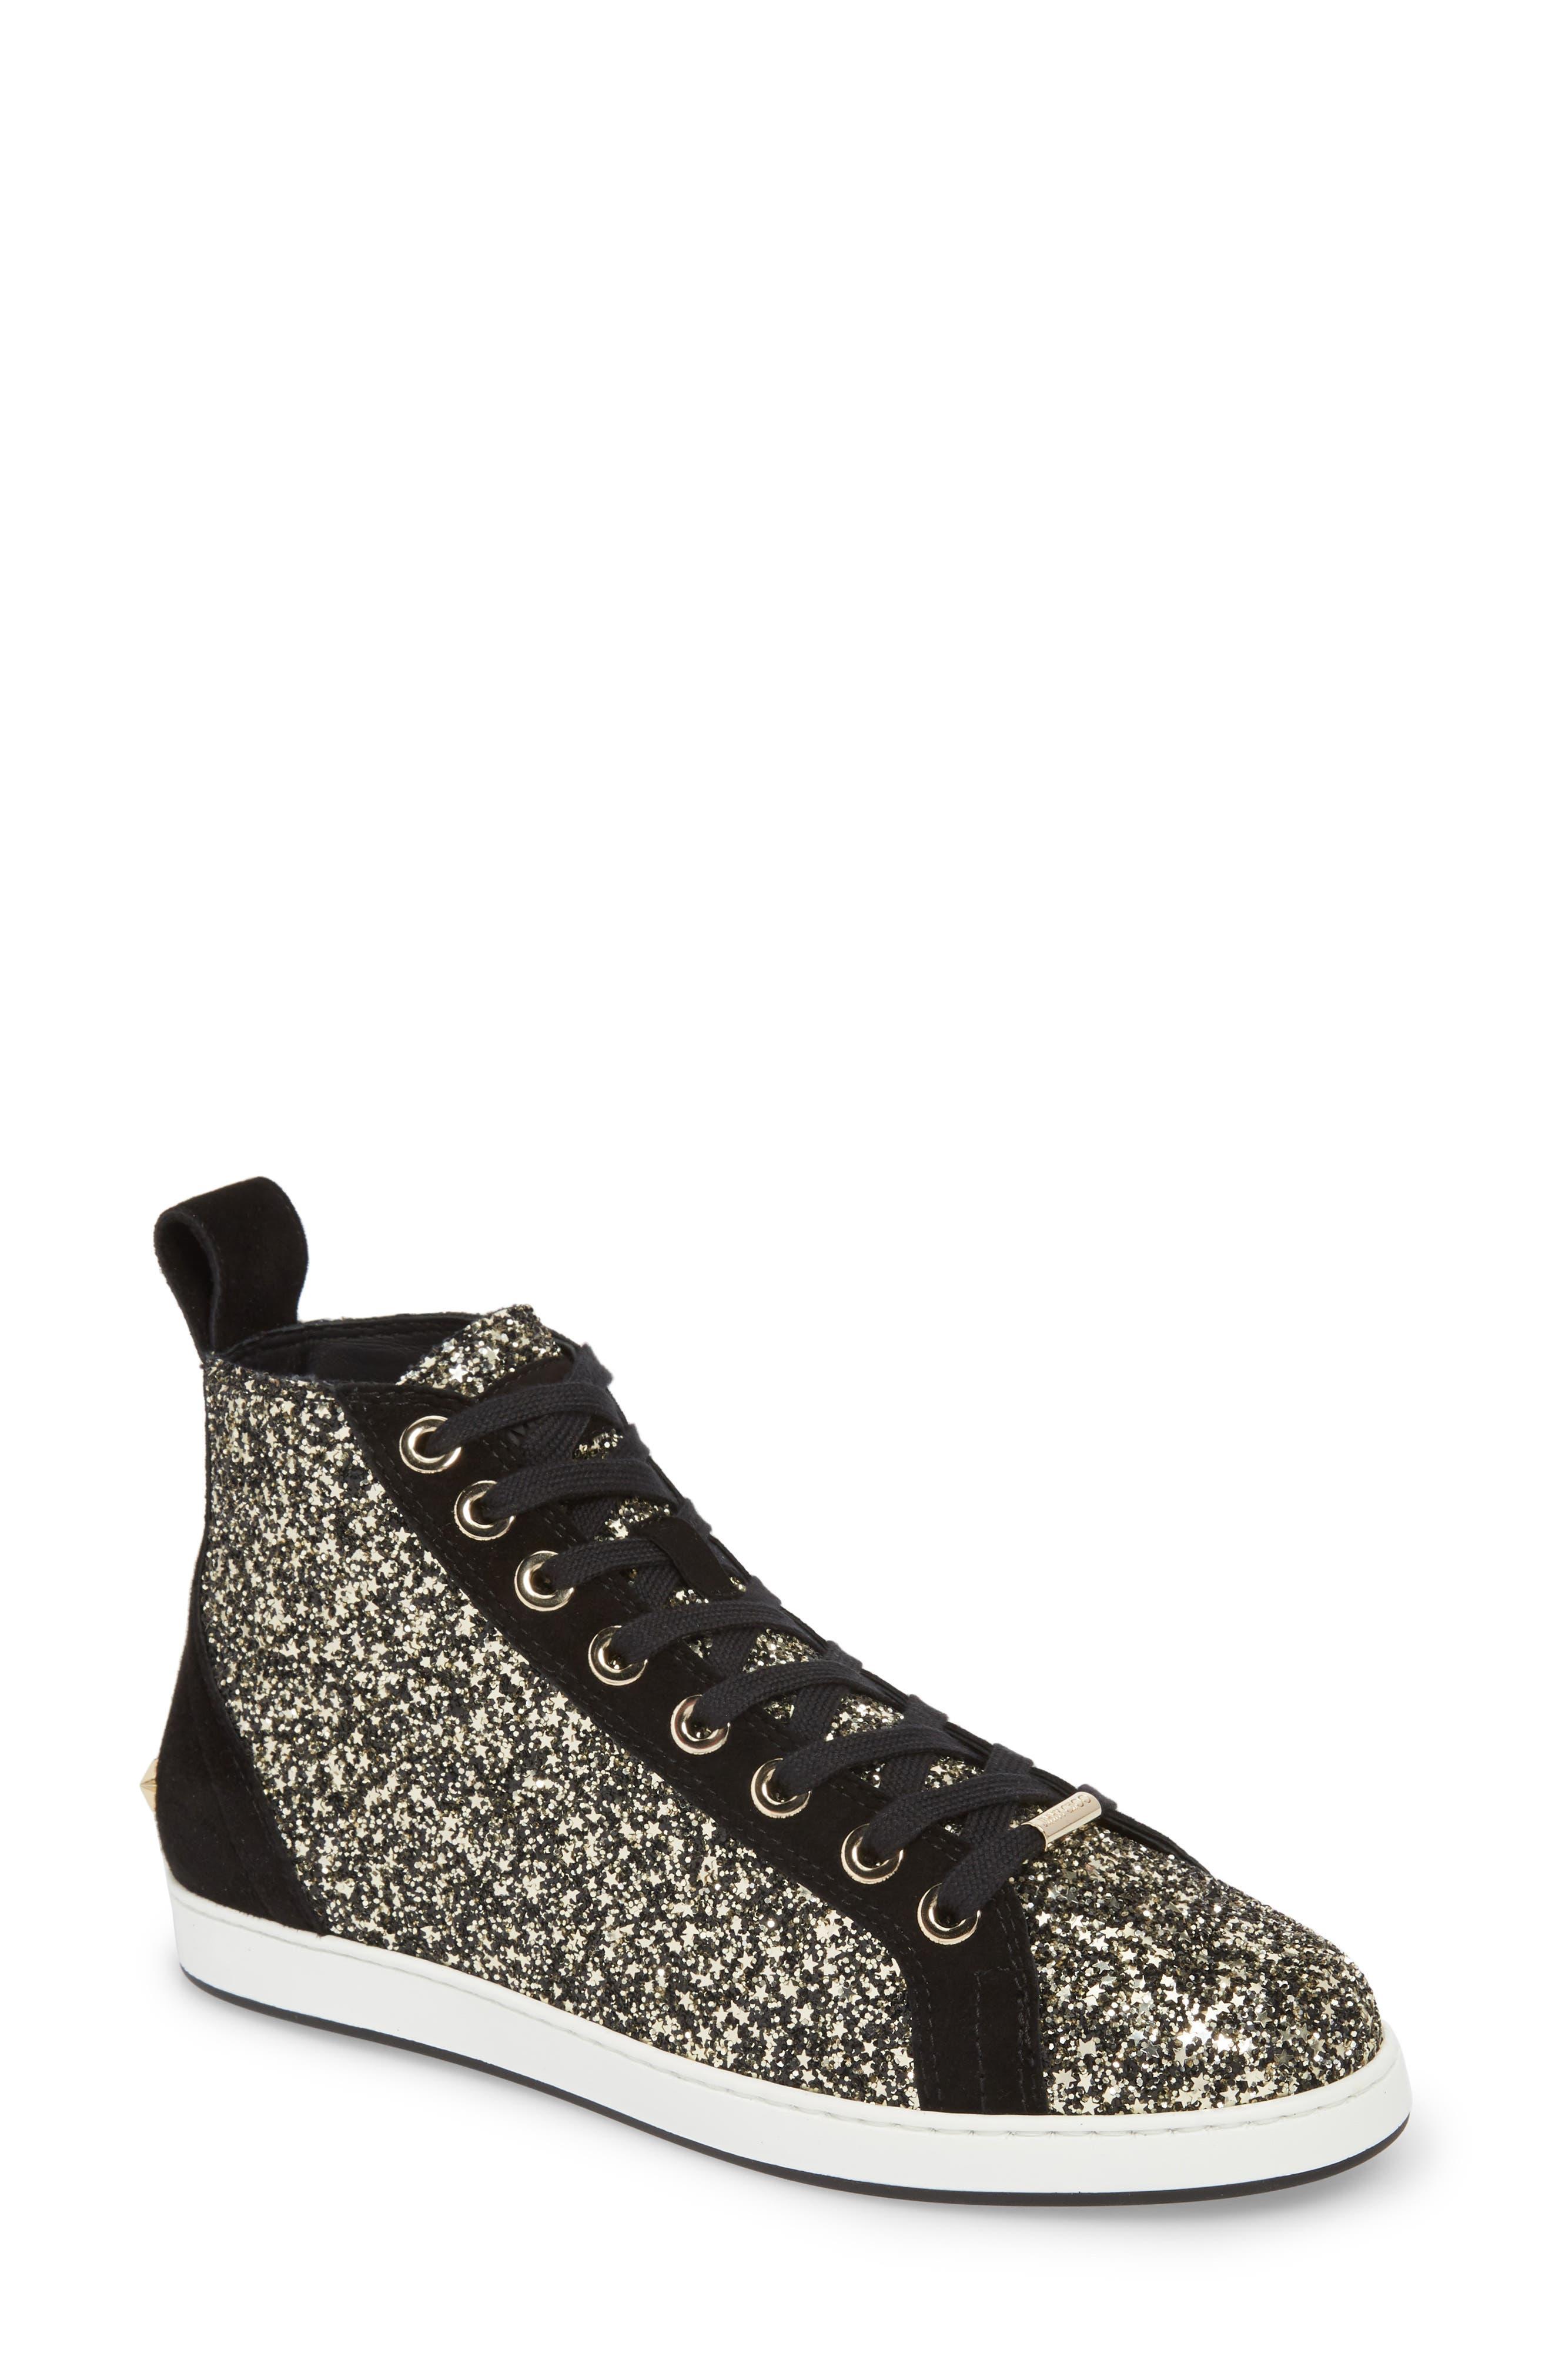 Colt Glitter High Top Sneaker,                         Main,                         color, 710